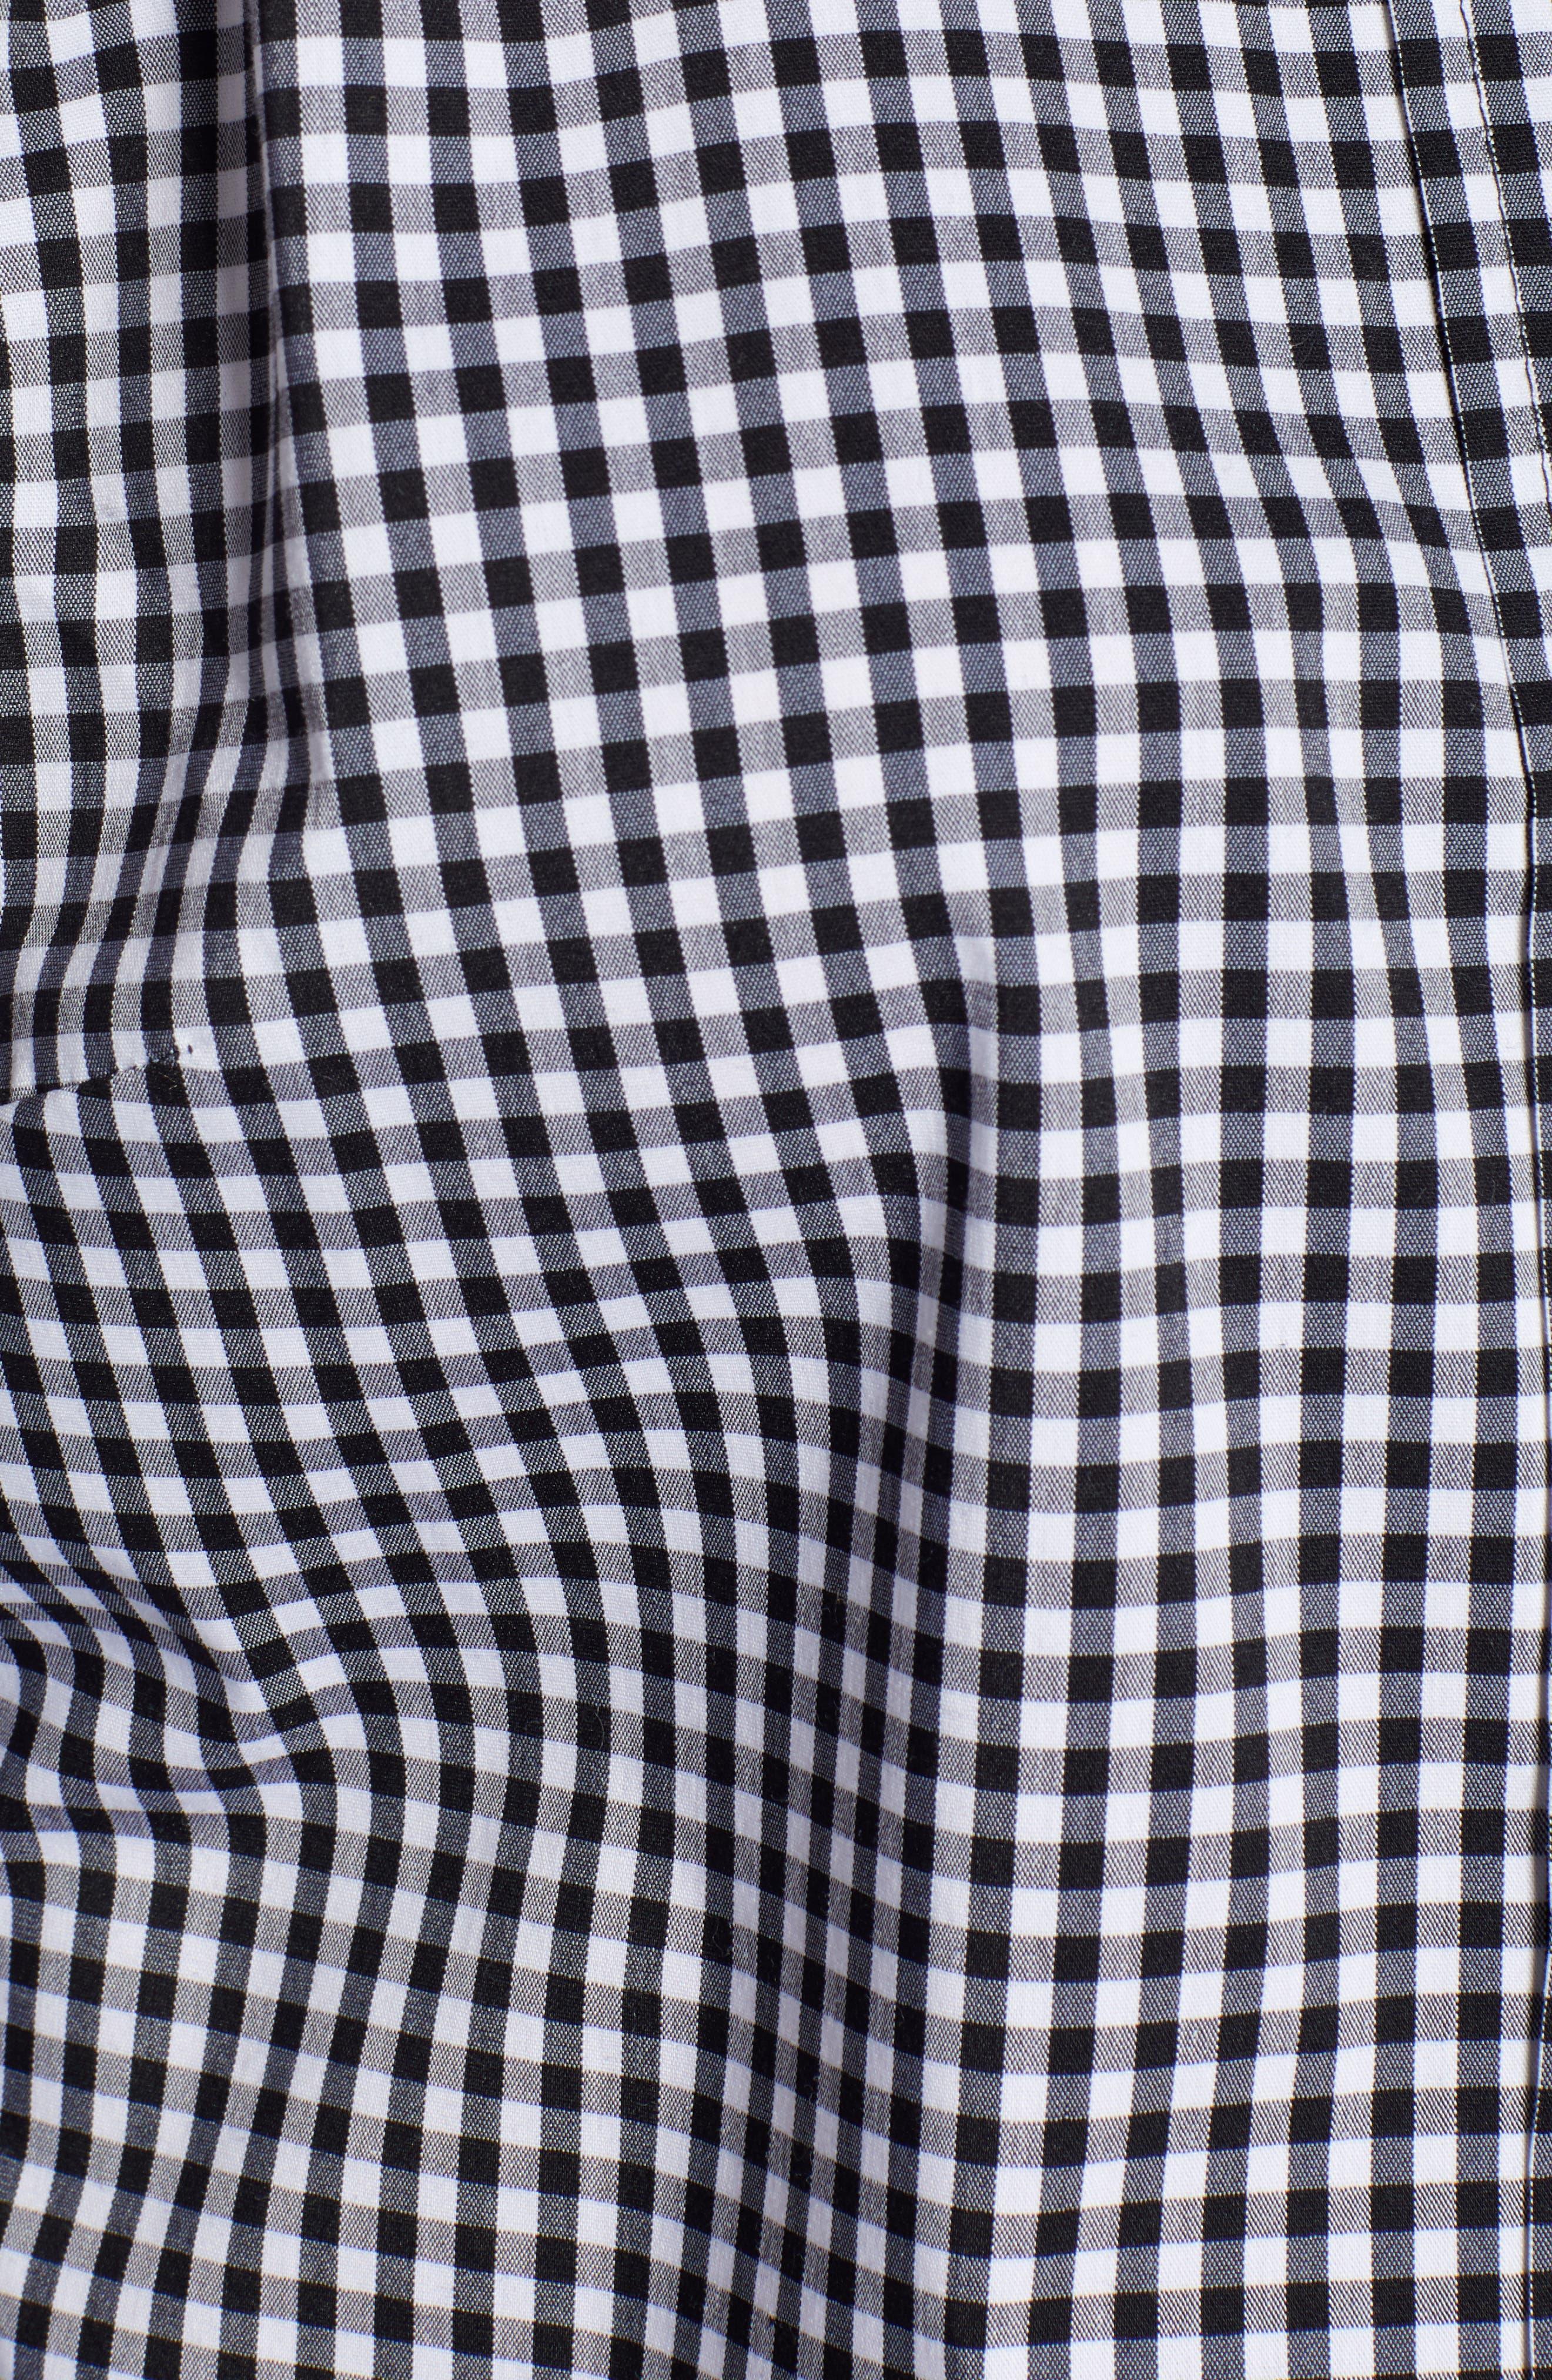 Stretch Cotton Blend Shirt,                             Alternate thumbnail 5, color,                             BLACK GINGHAM